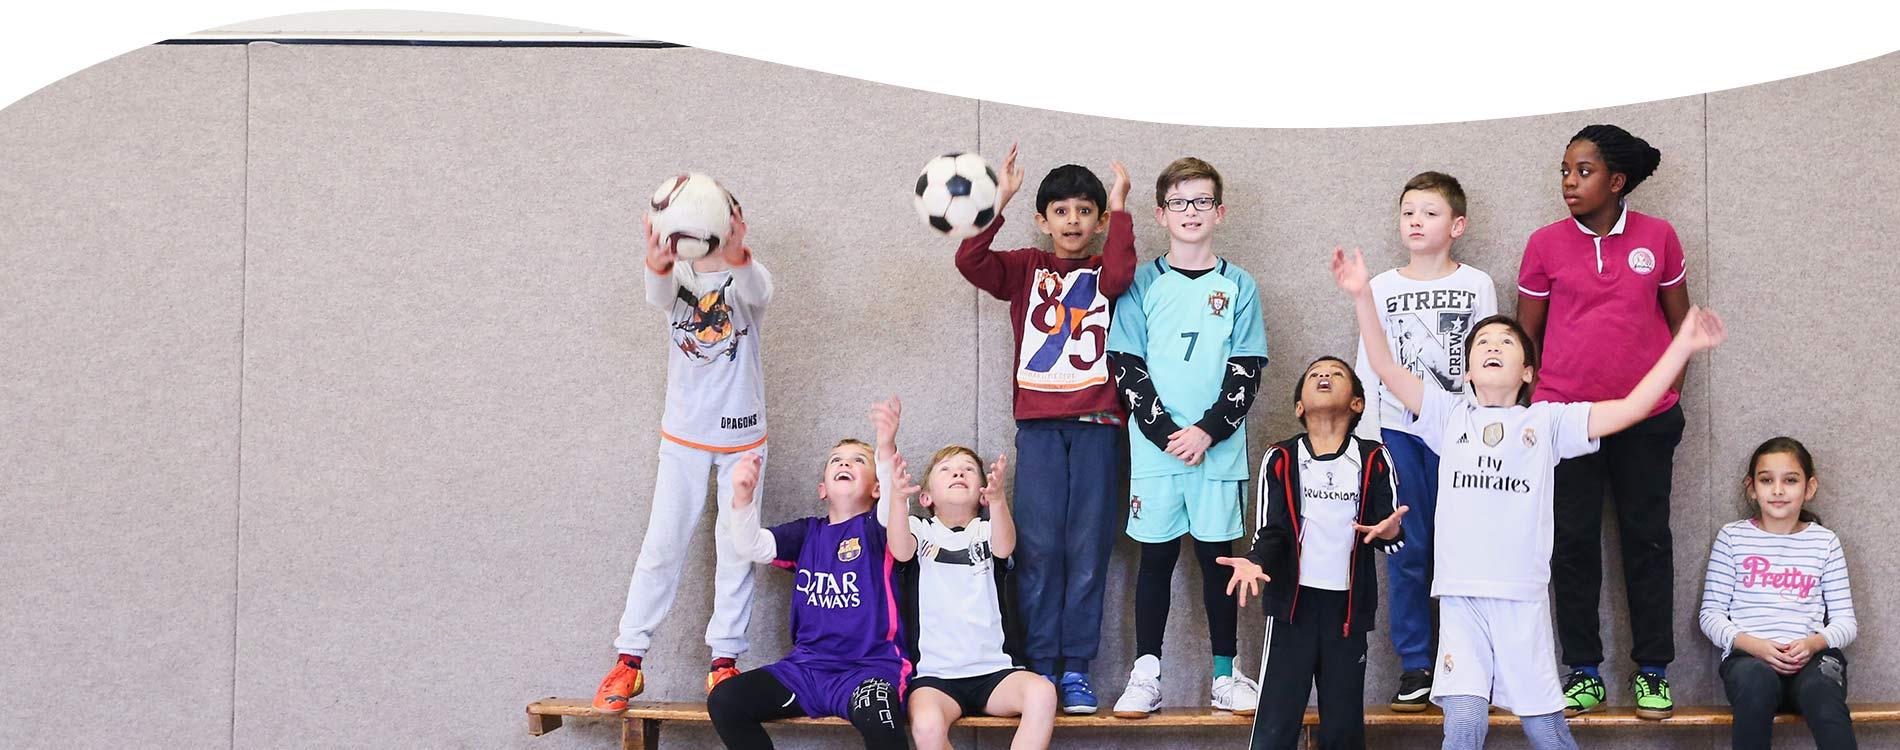 LITCAM - Fussball trifft Kultur